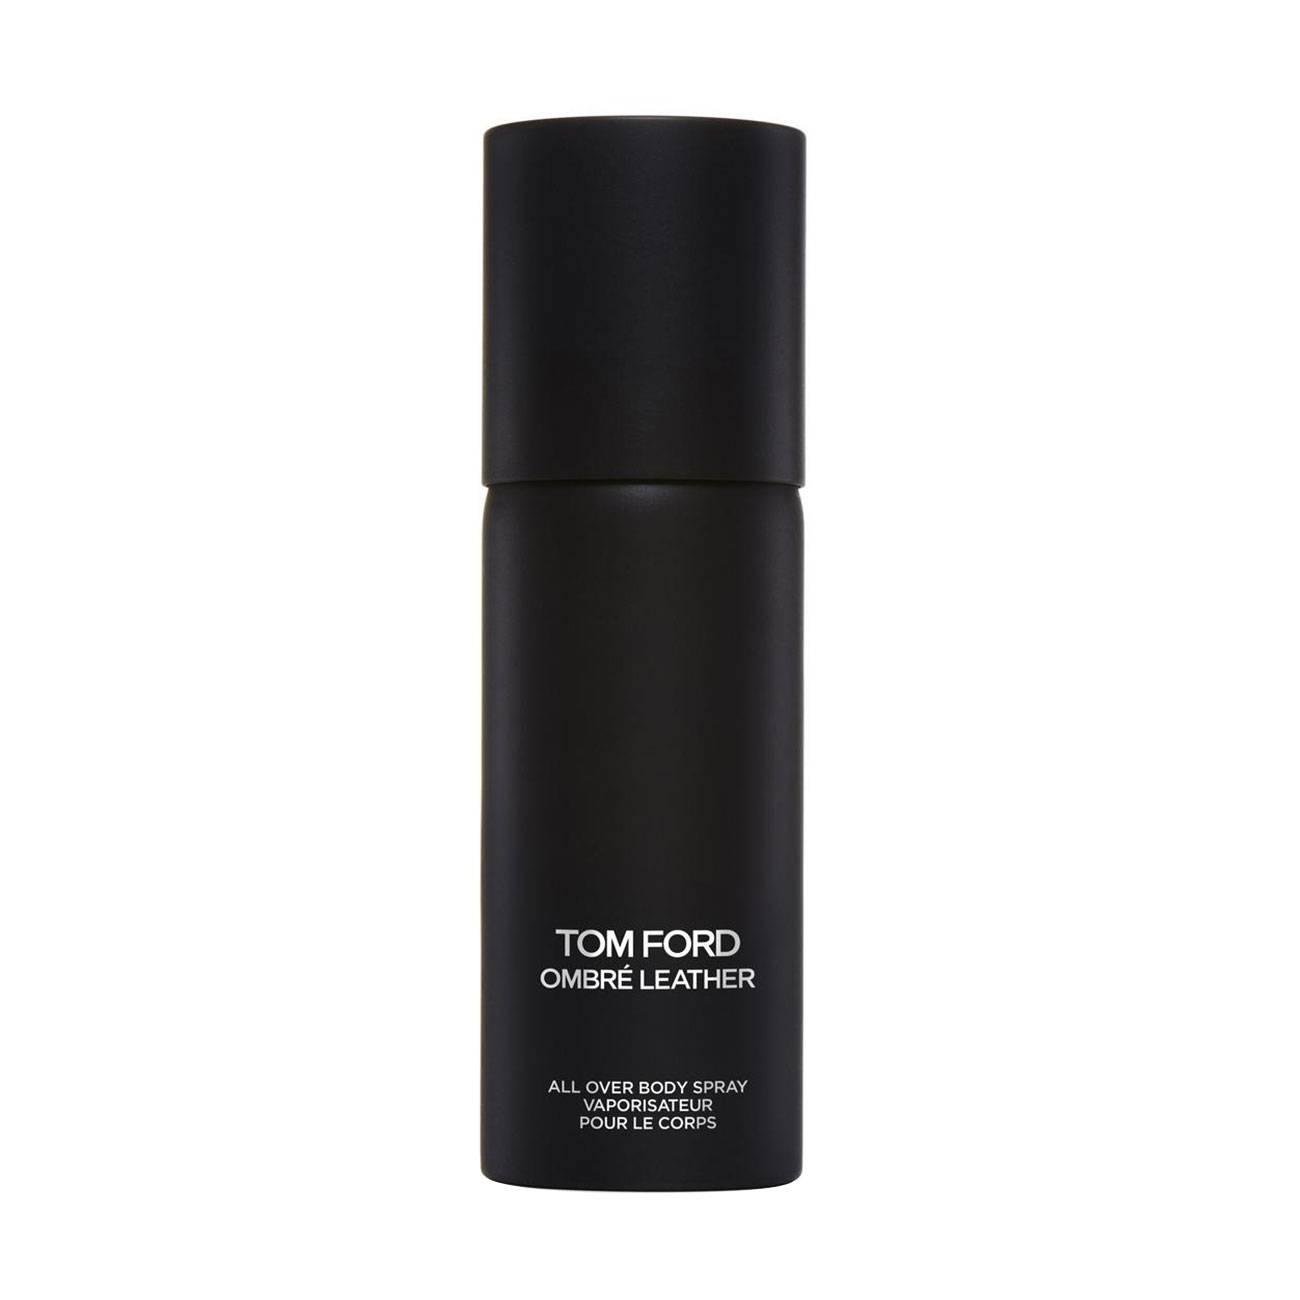 Ombre Leather Body Spray (150 ml)